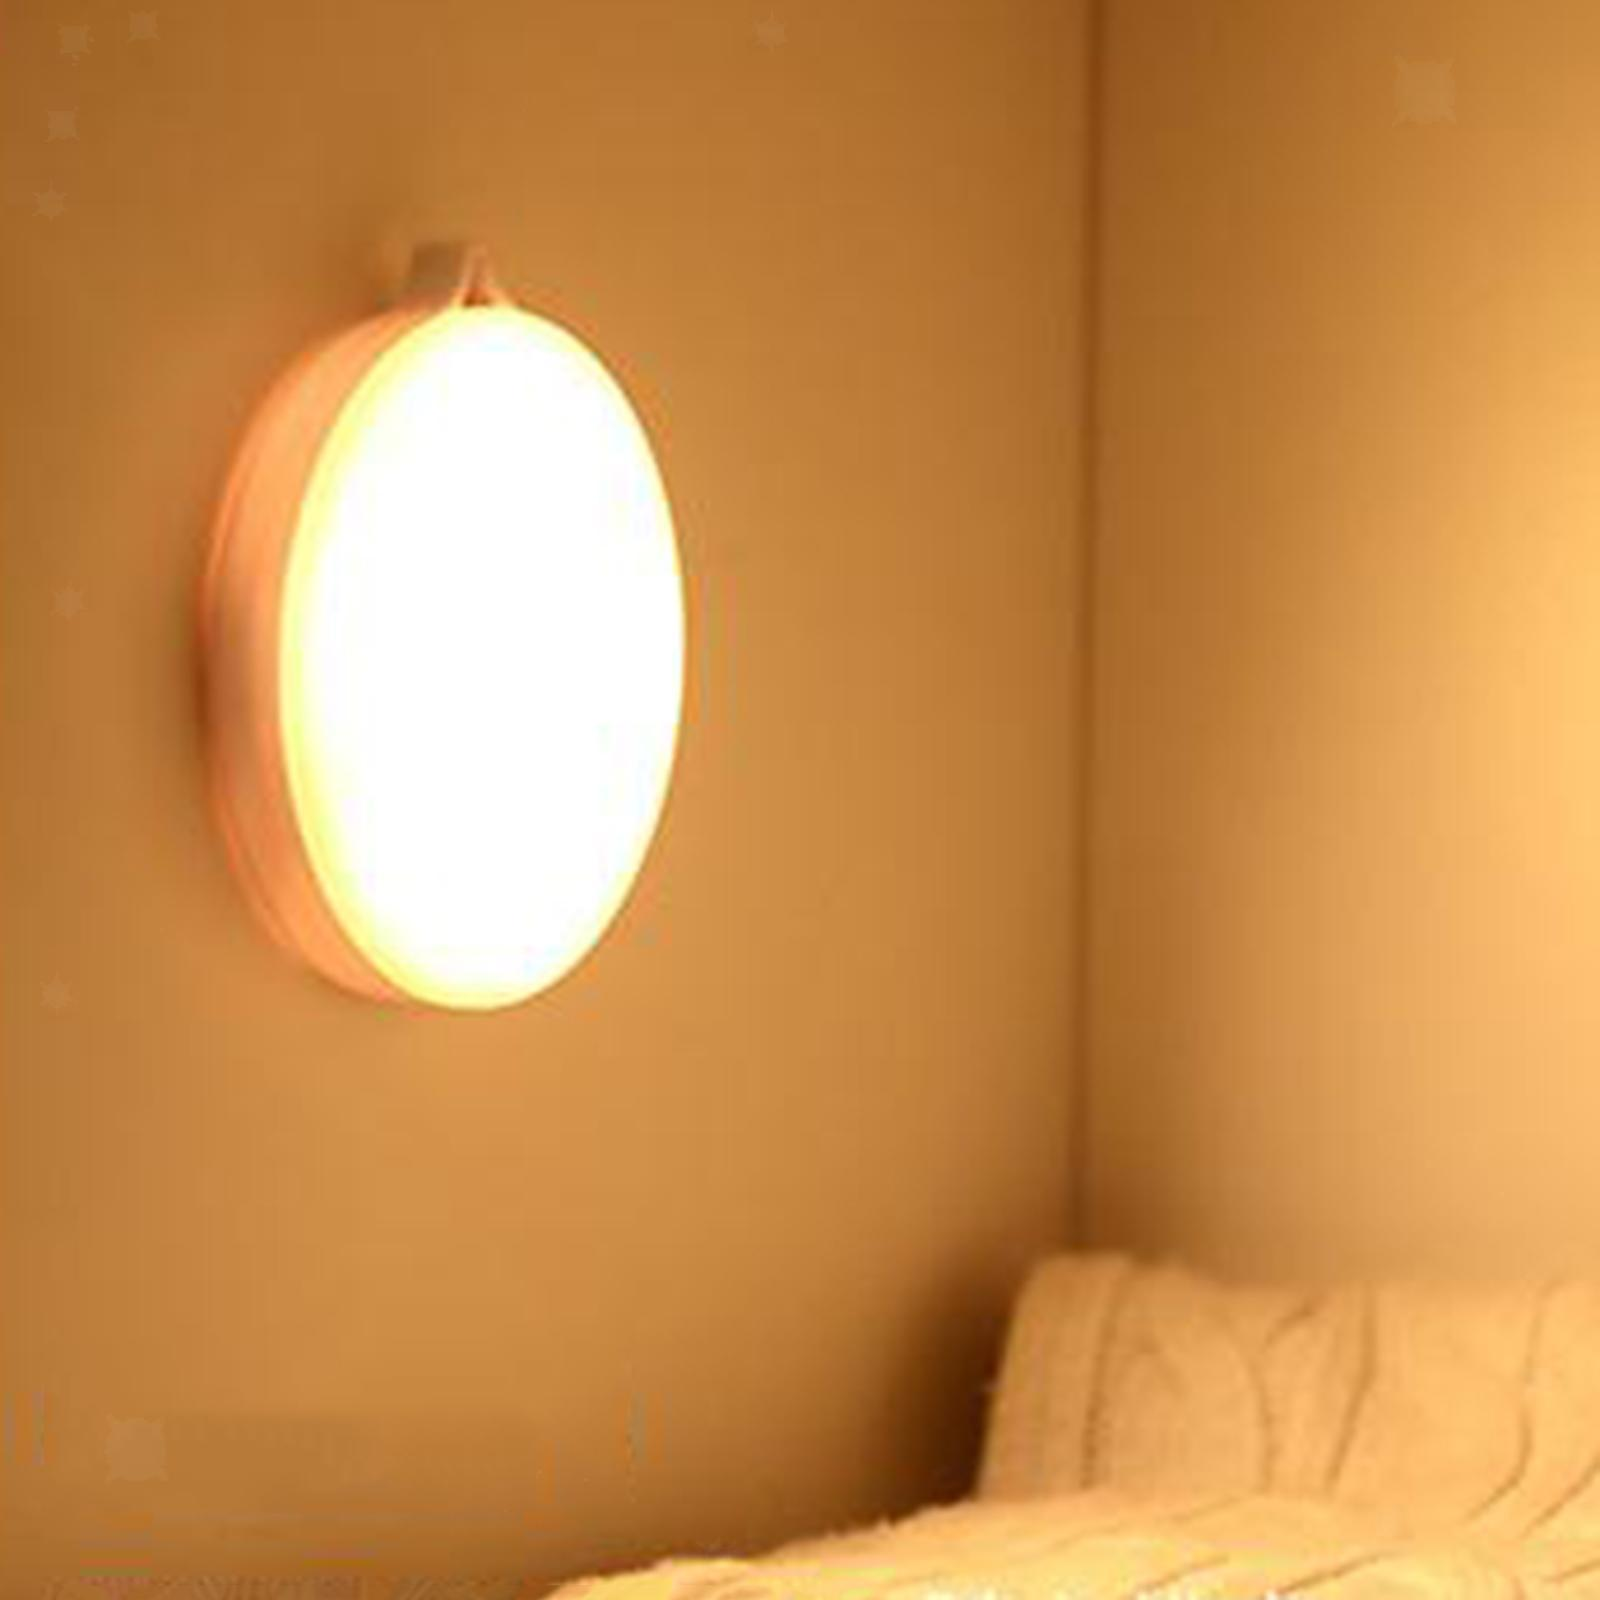 miniatura 7 - Luce notturna a LED per camera da letto ricaricabile USB per Hotel con sensore